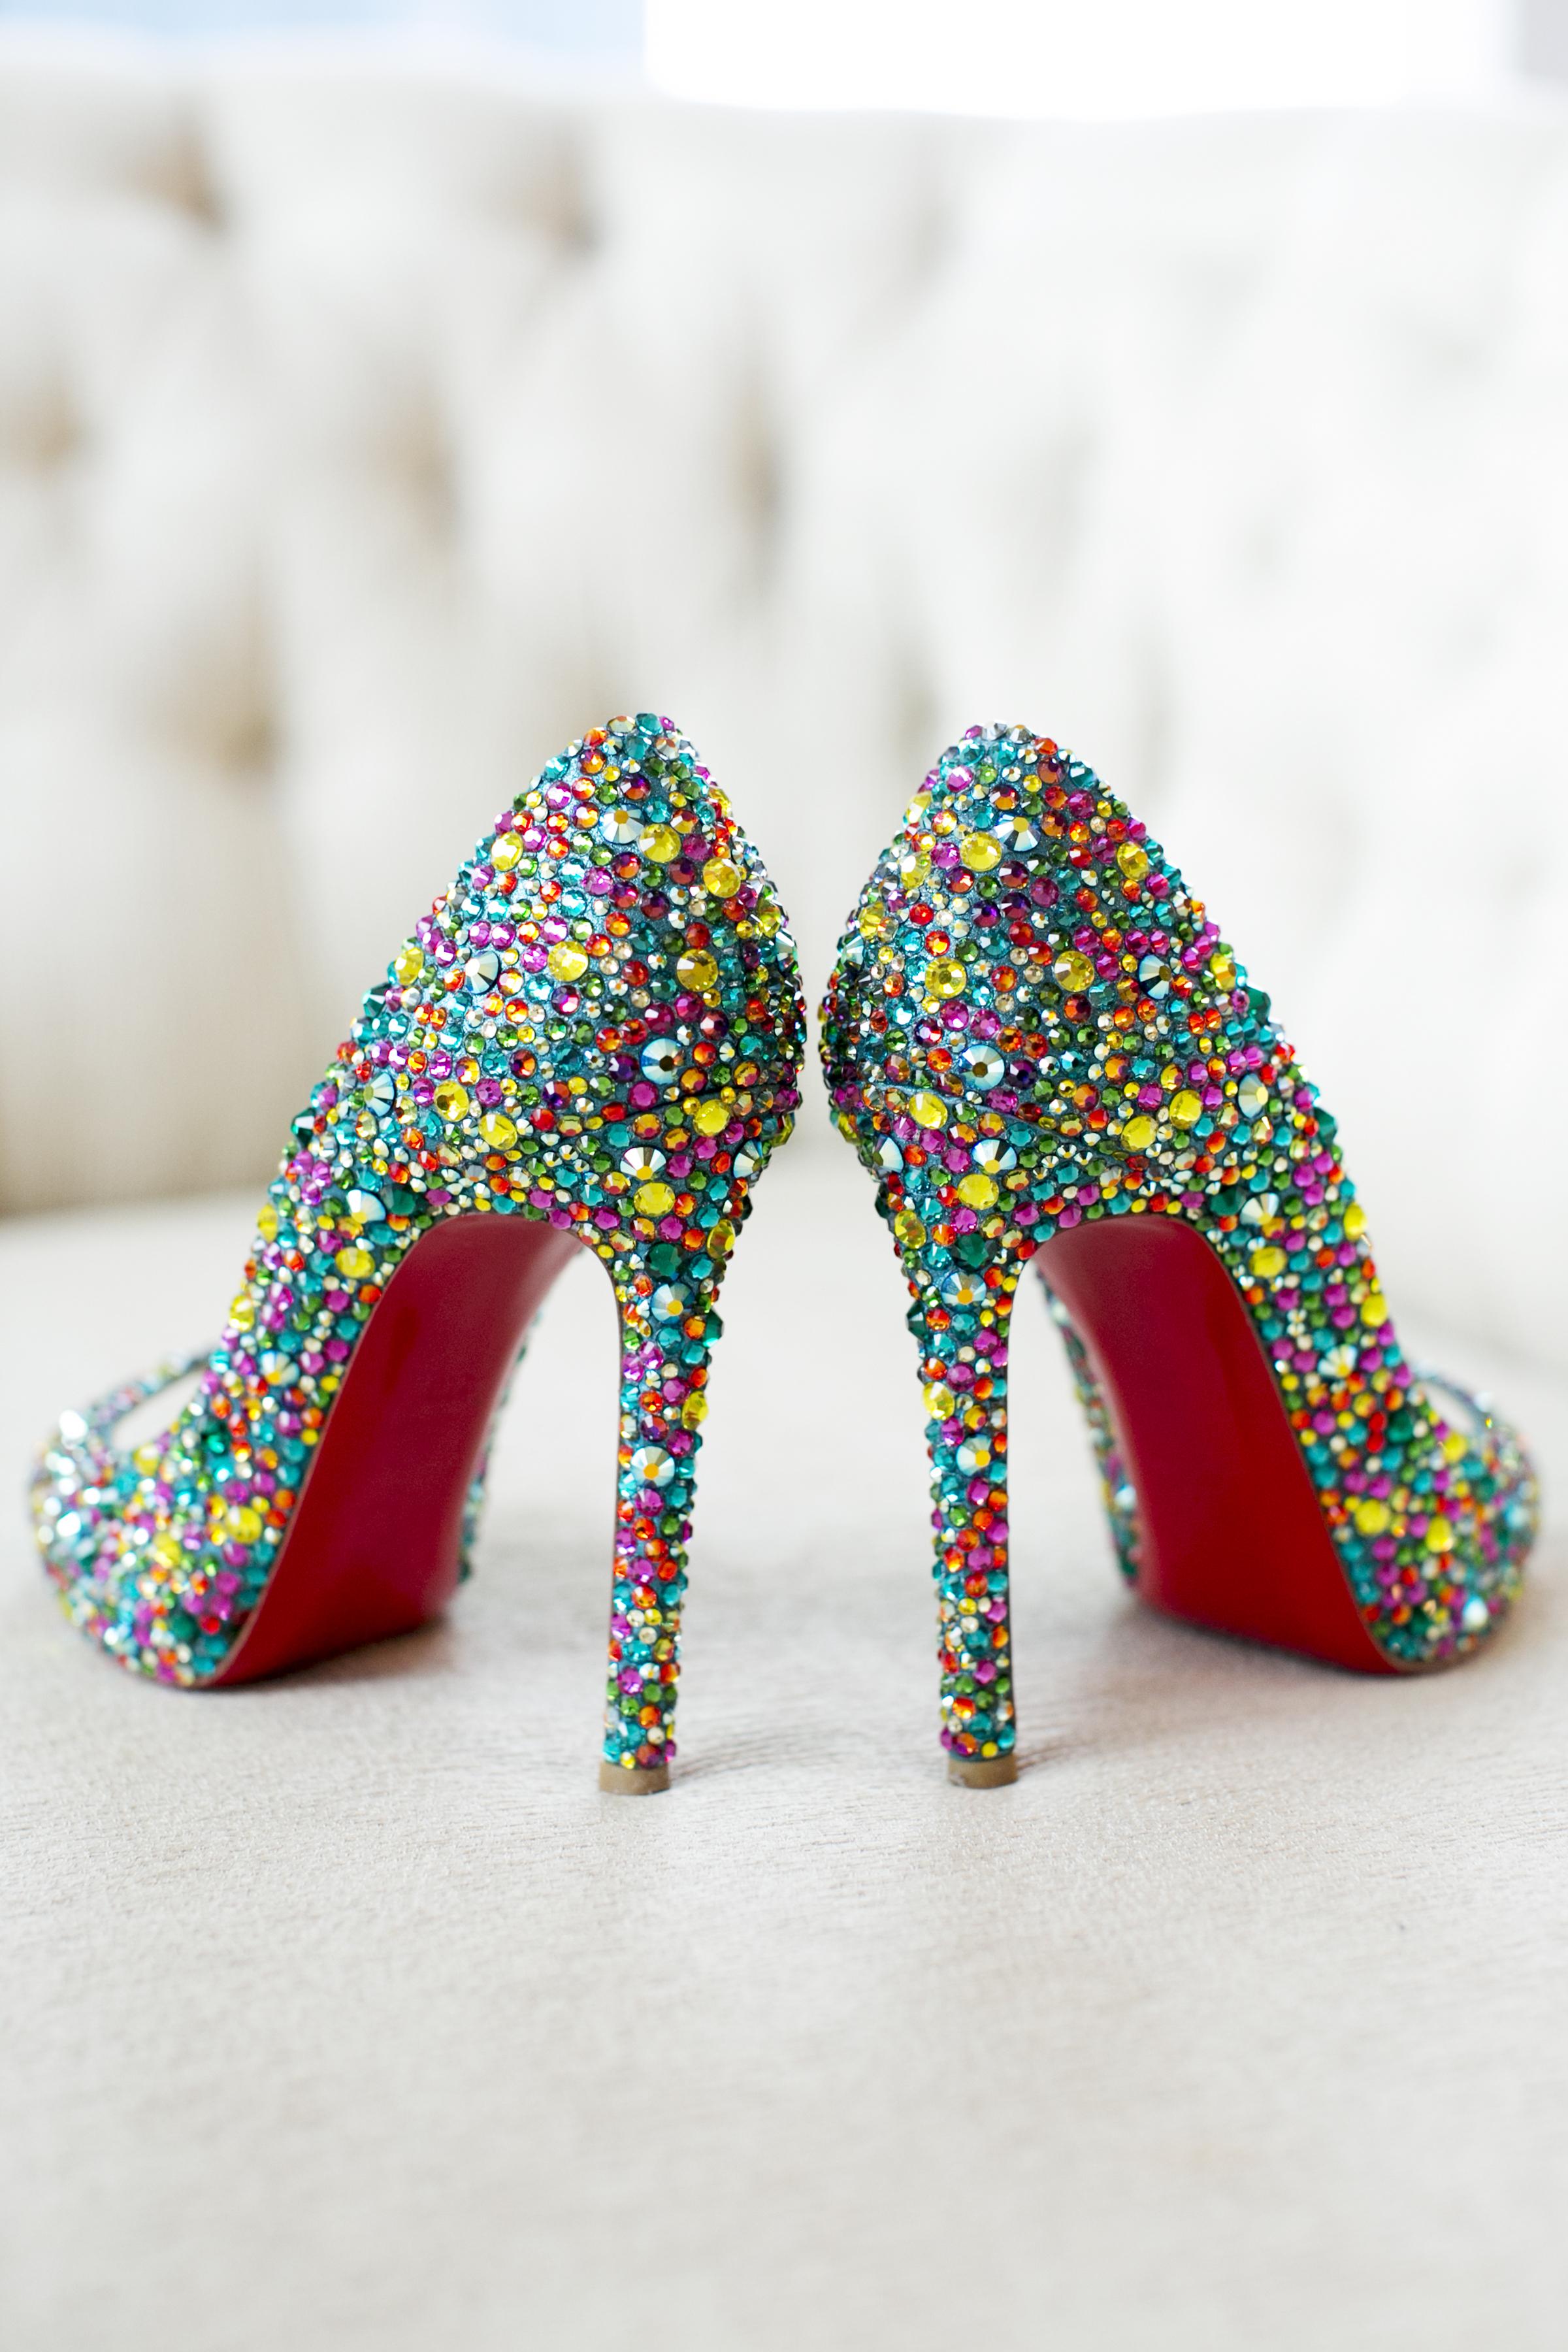 NYC-Wedding-Planner-Andrea-Freeman-Events-Mandarin-Oriental-2-1.jpg